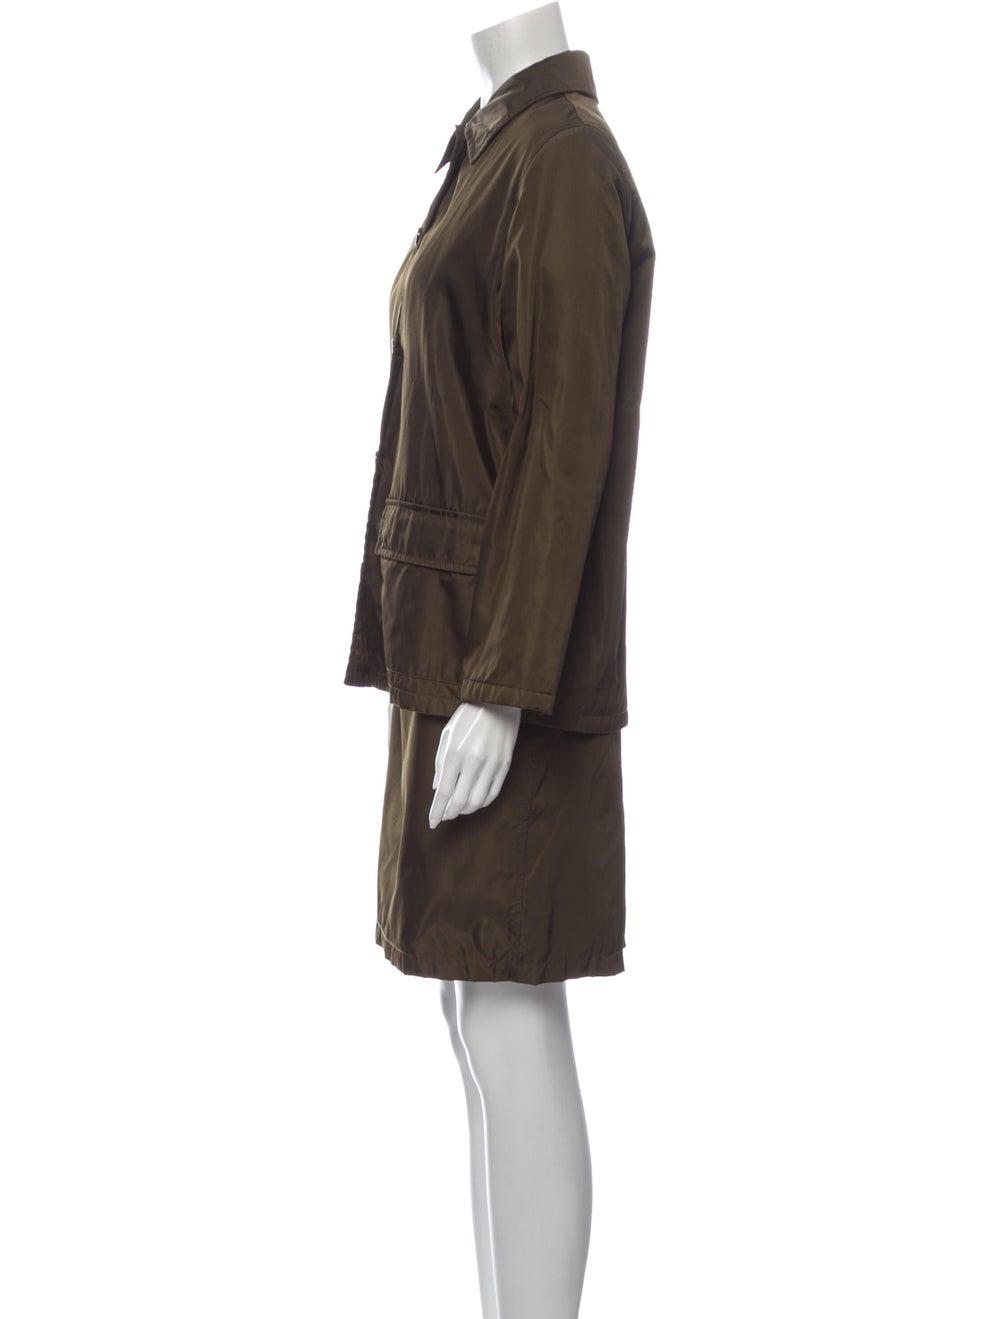 Prada Skirt Suit Green - image 2